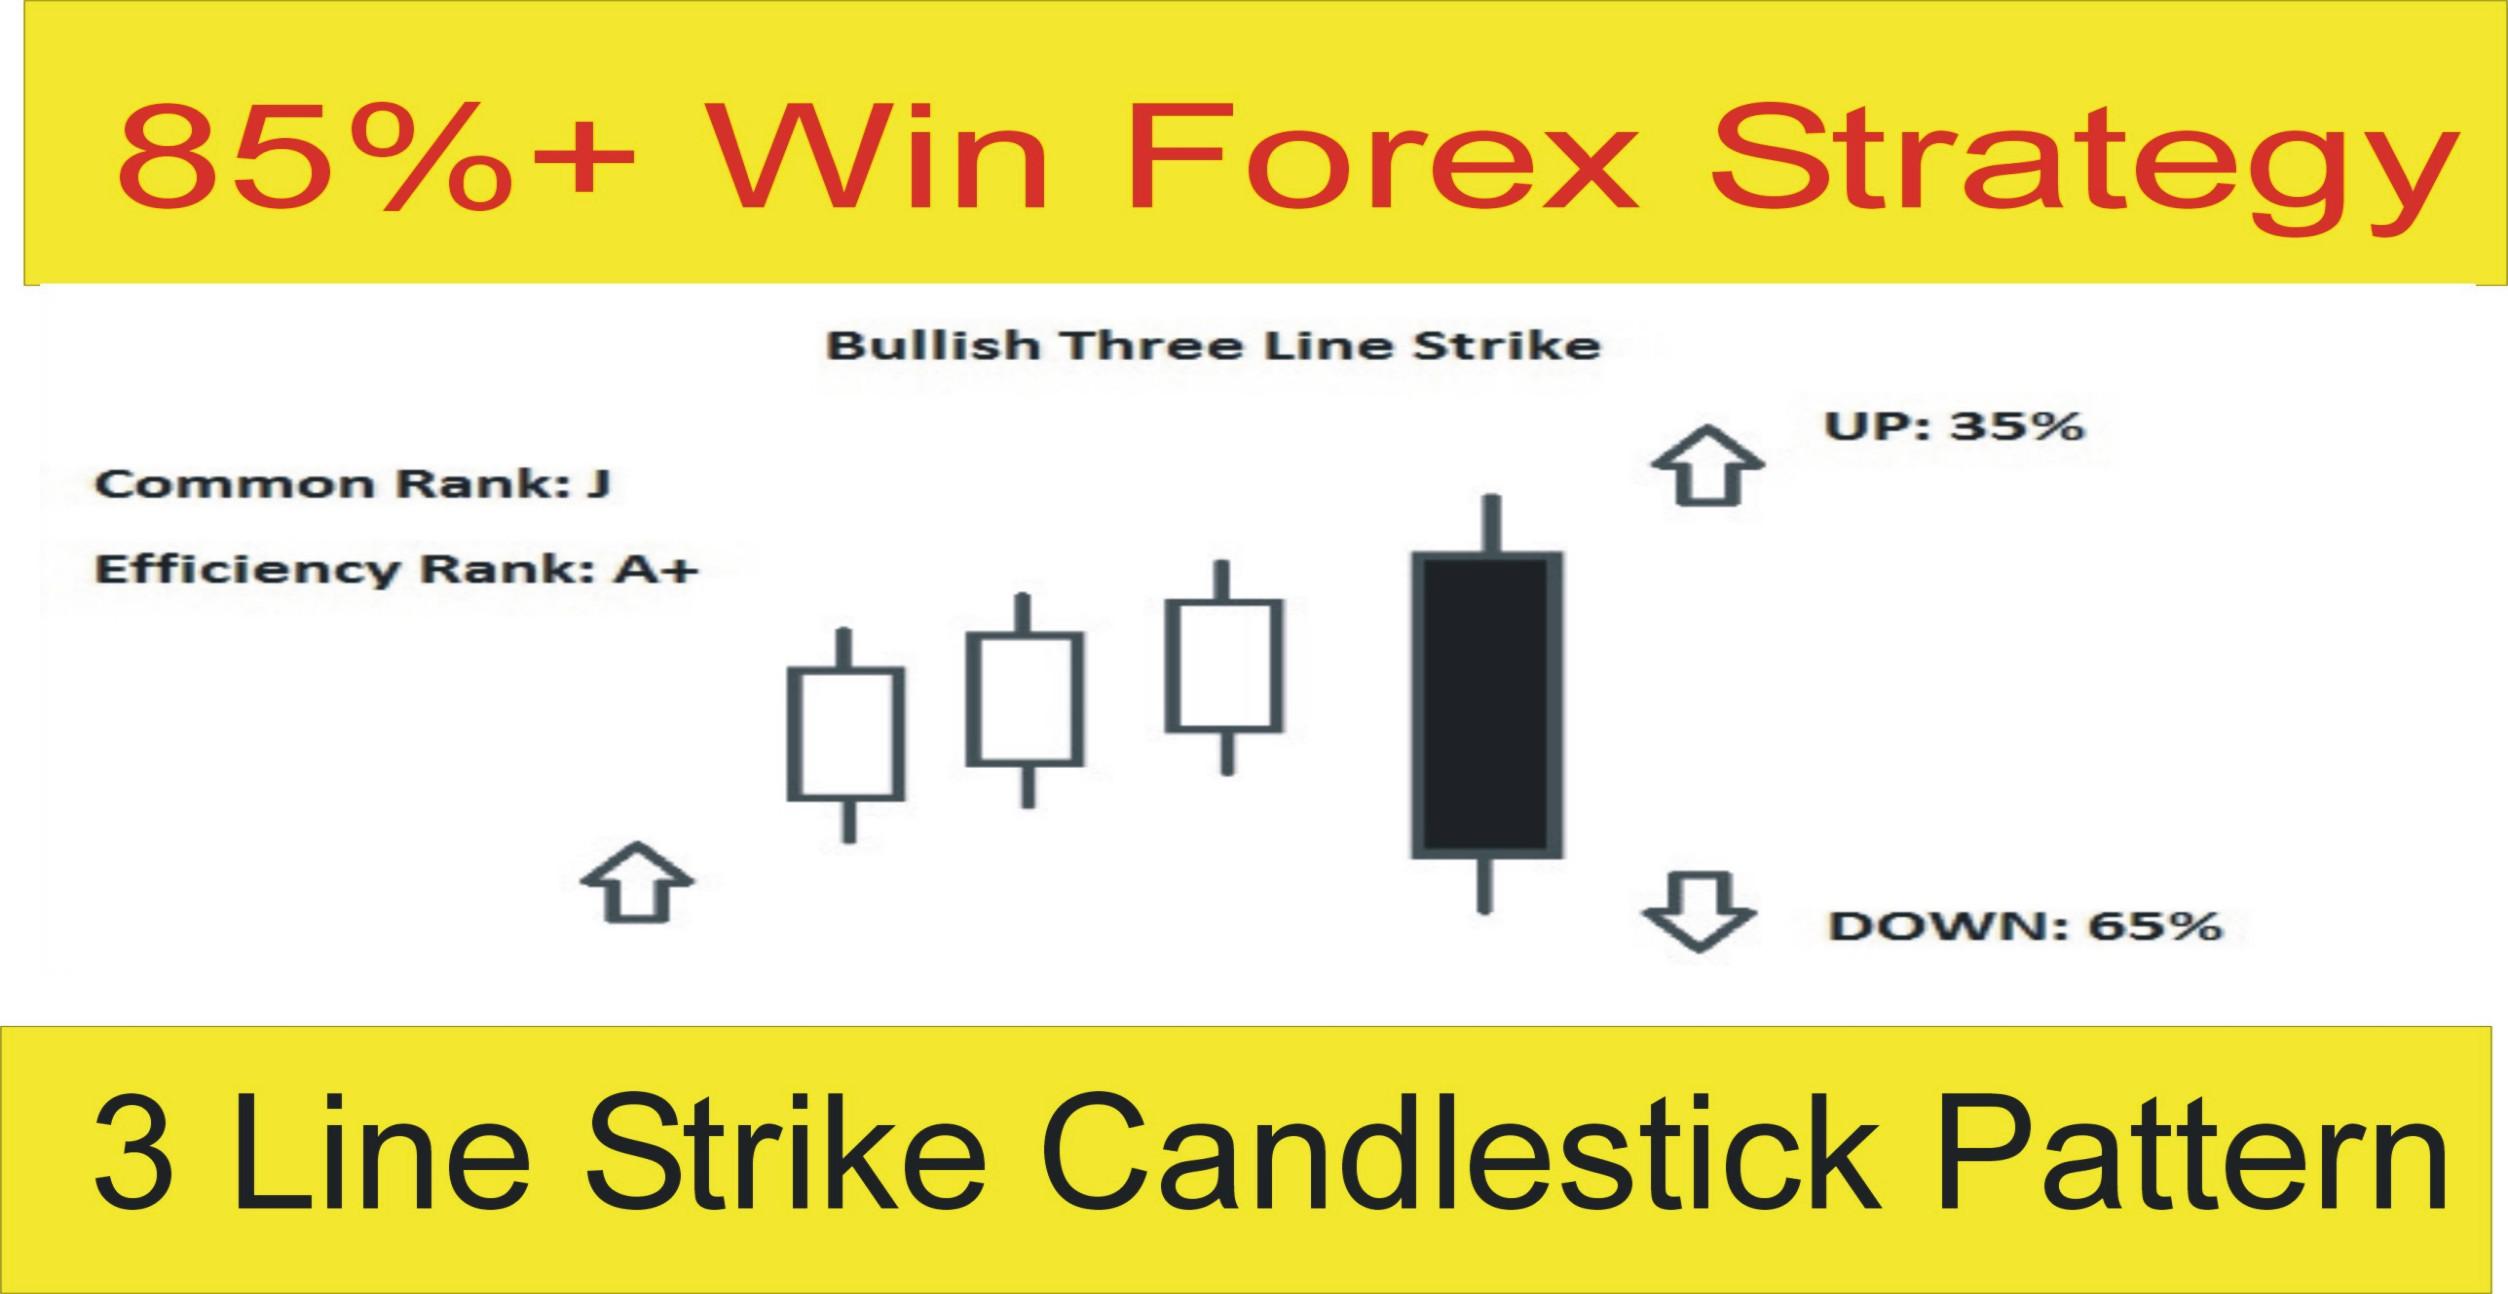 Three Line Strike Candlestick Pattern Price Action Tutorial Tani